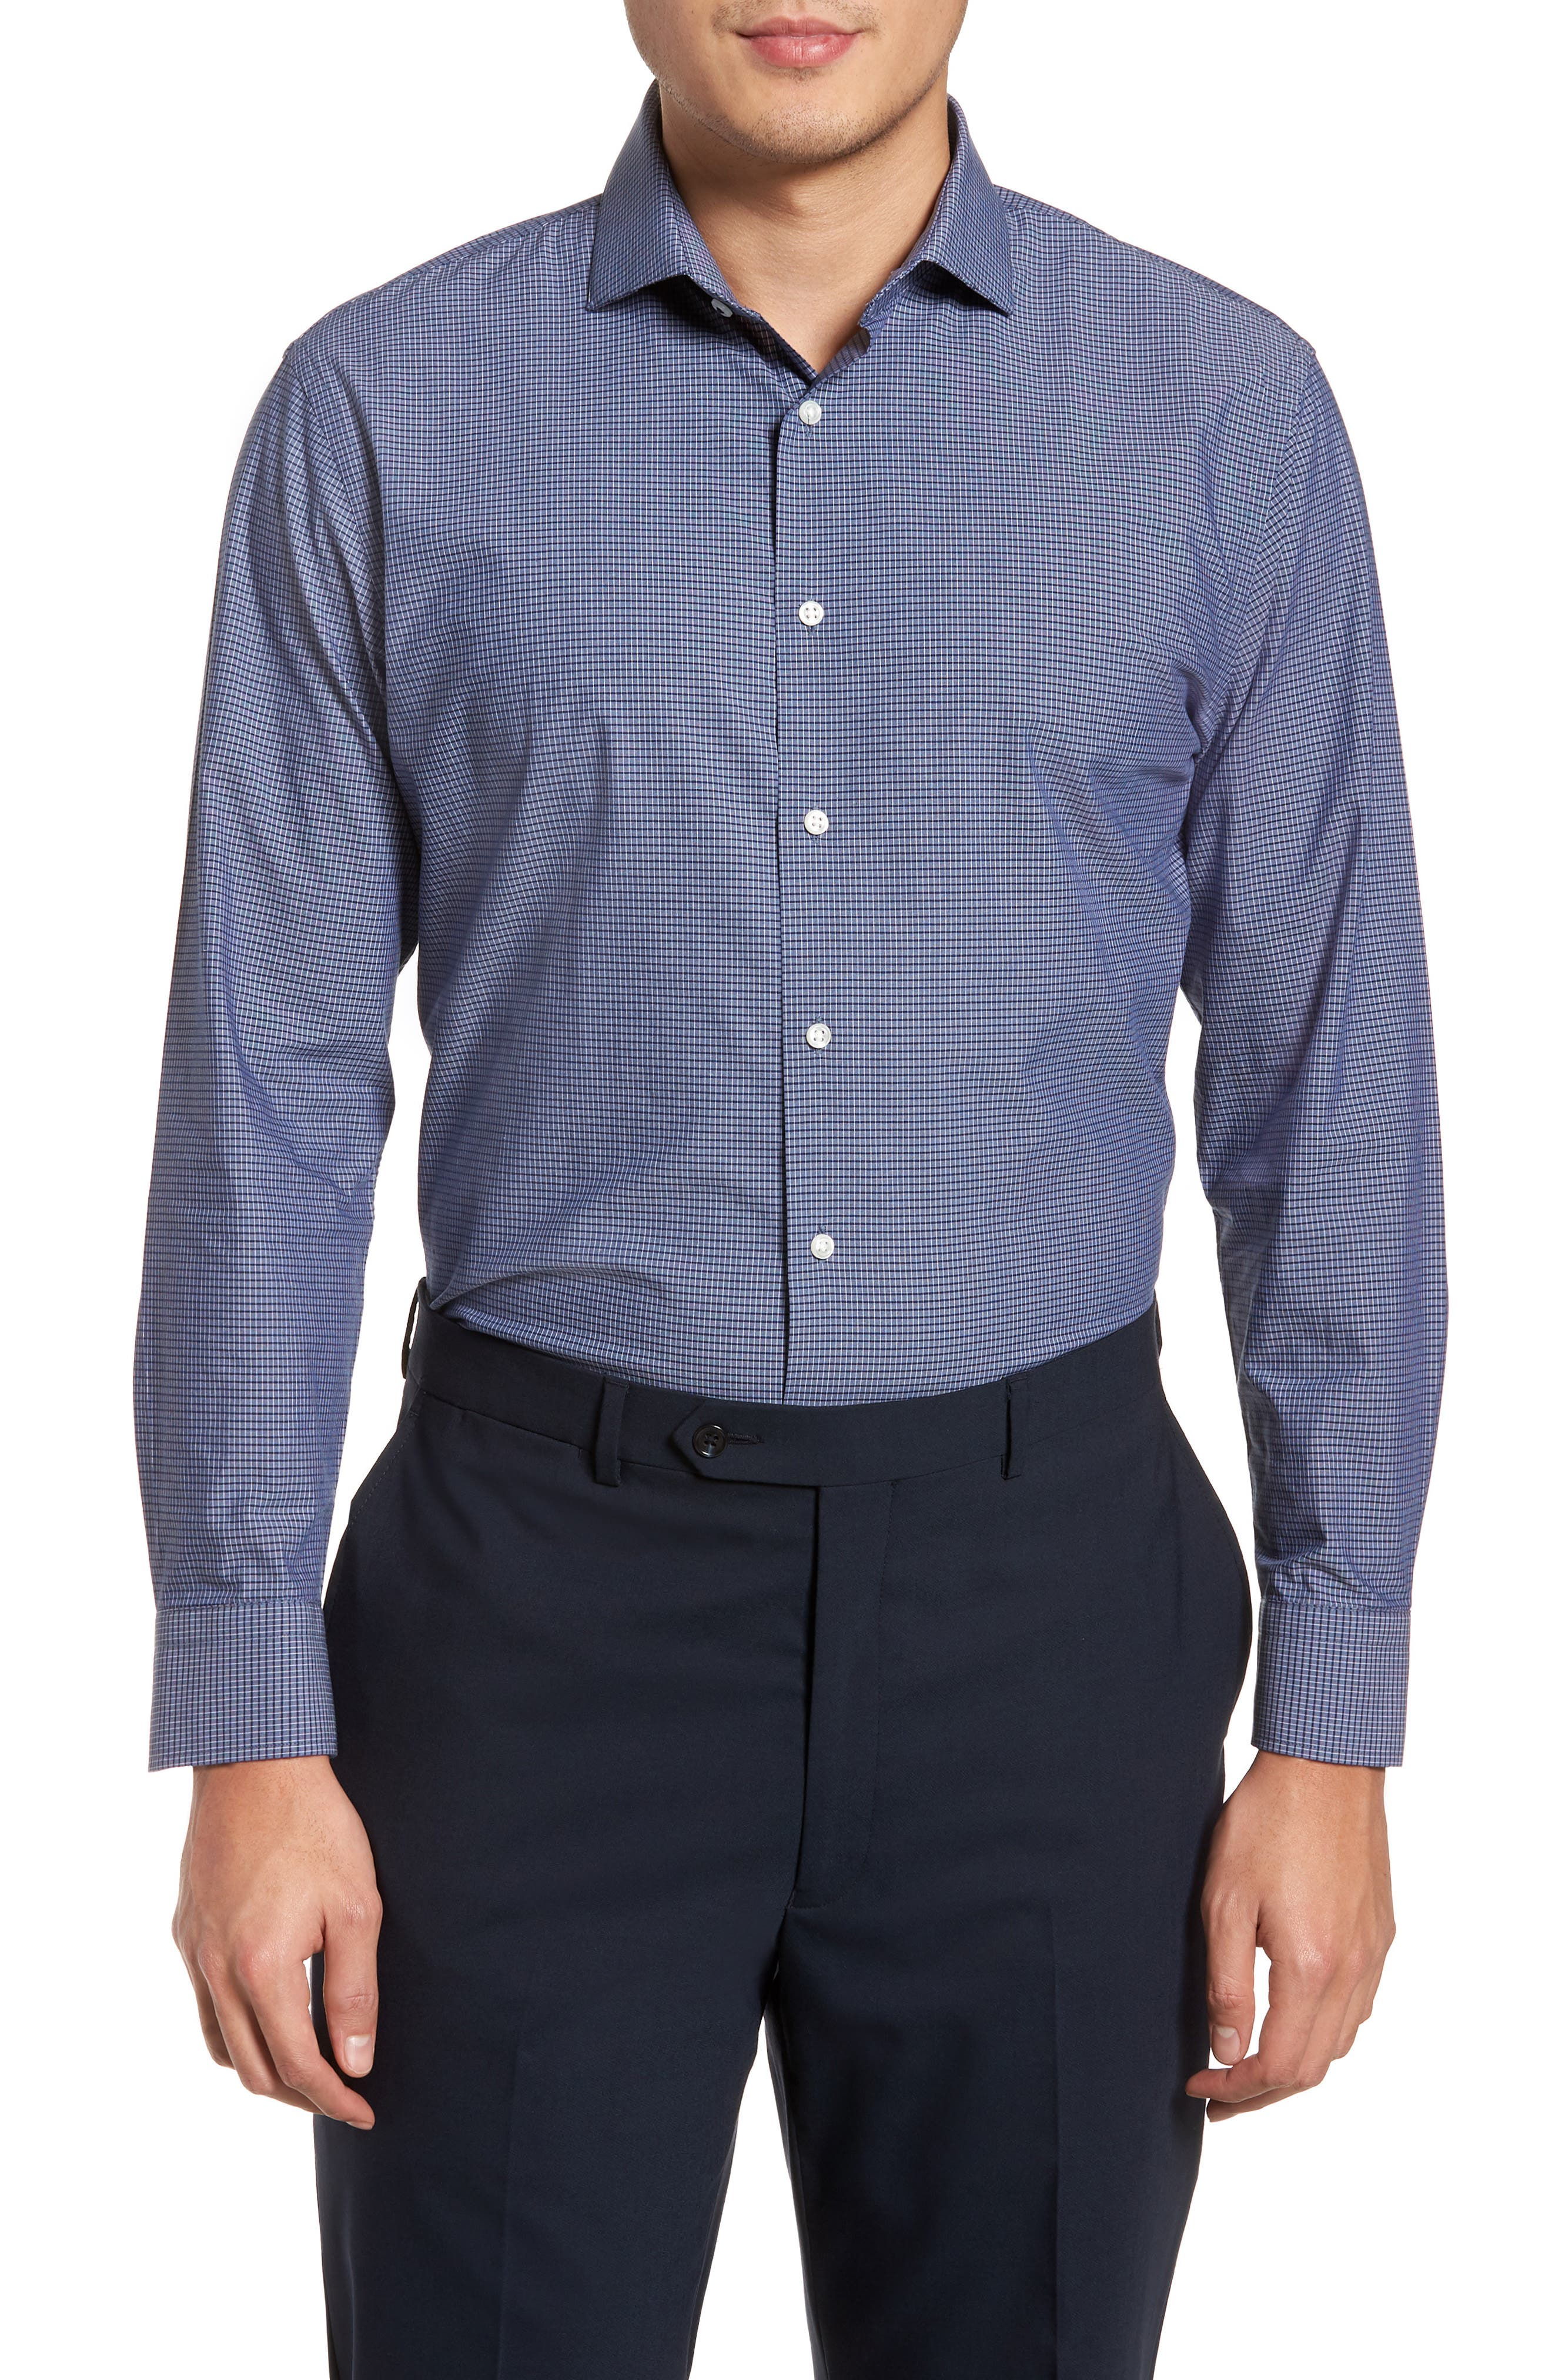 Tech-Smart Trim Fit Stretch Check Dress Shirt,                         Main,                         color, 410